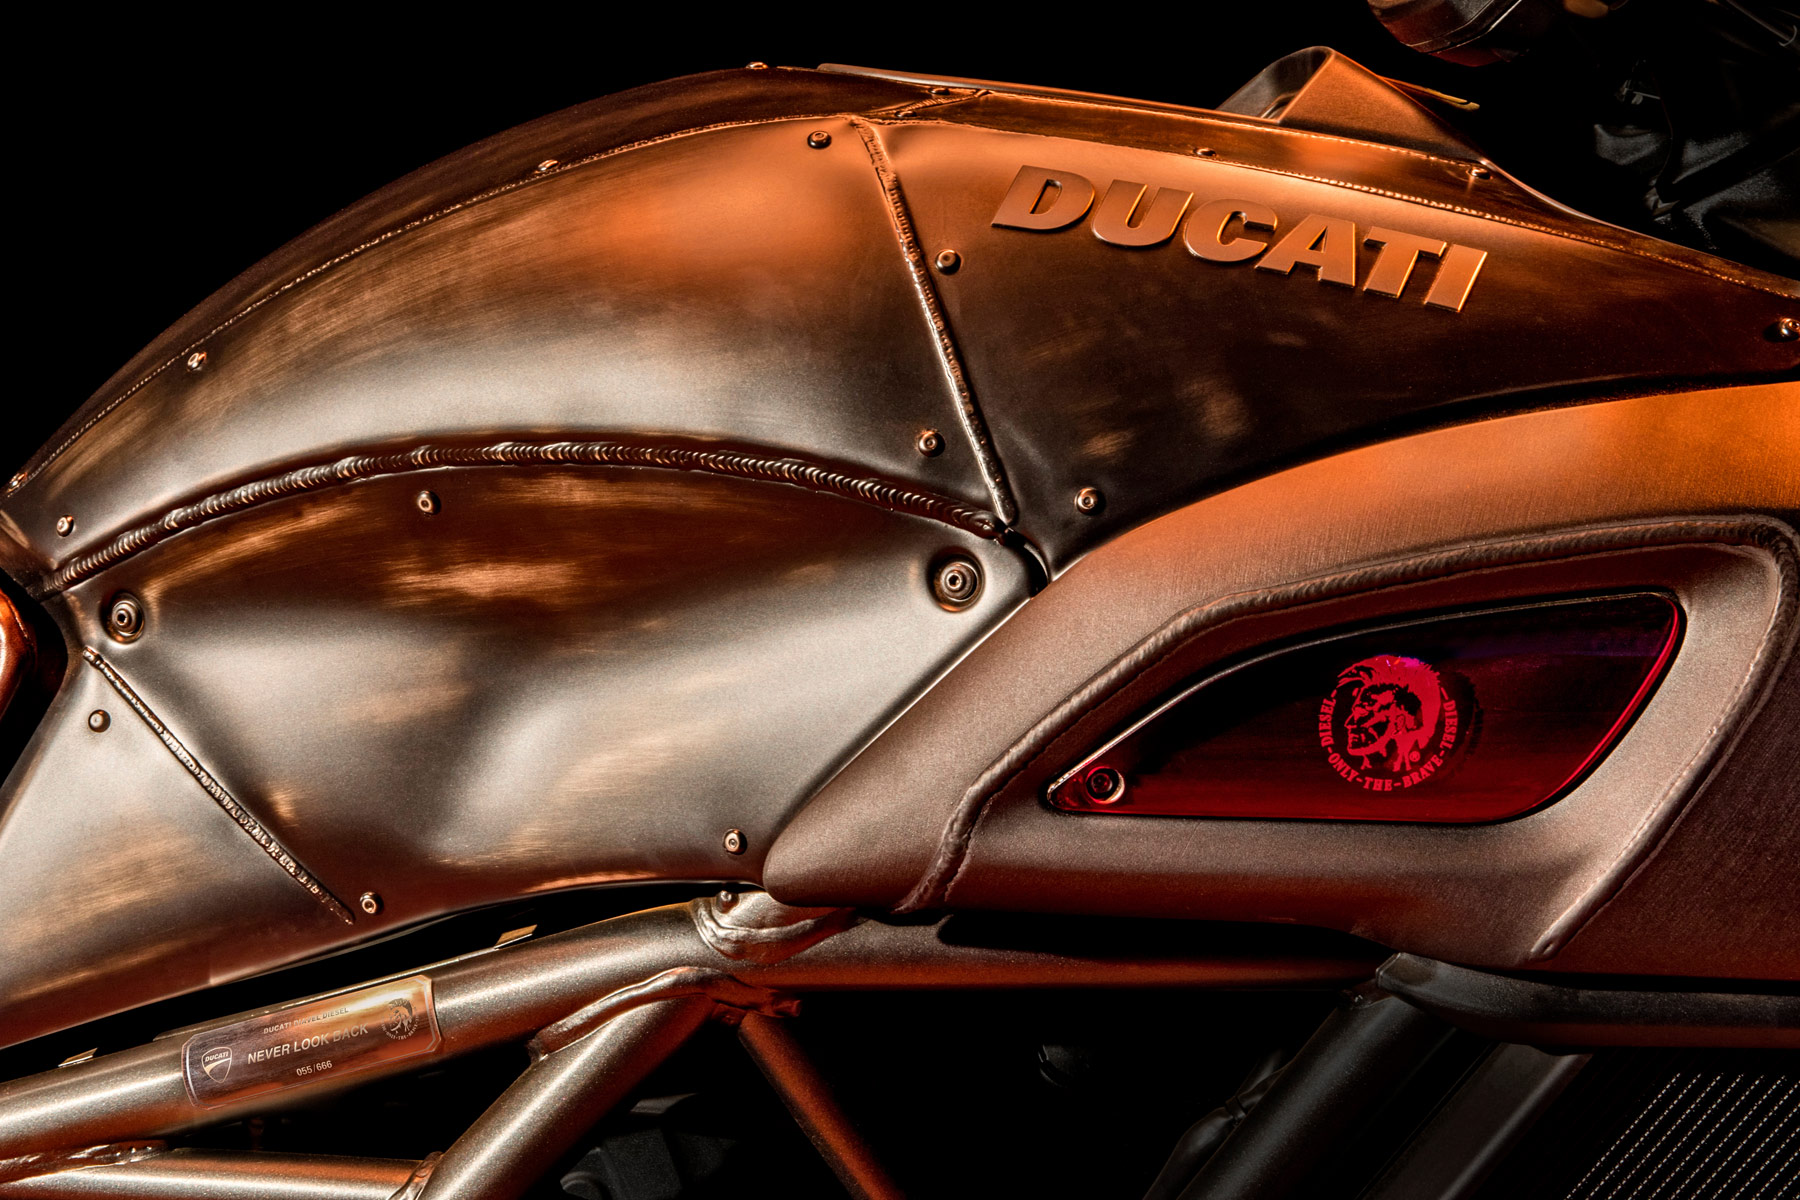 Ducati-Diavel-Diesel-large-image-4